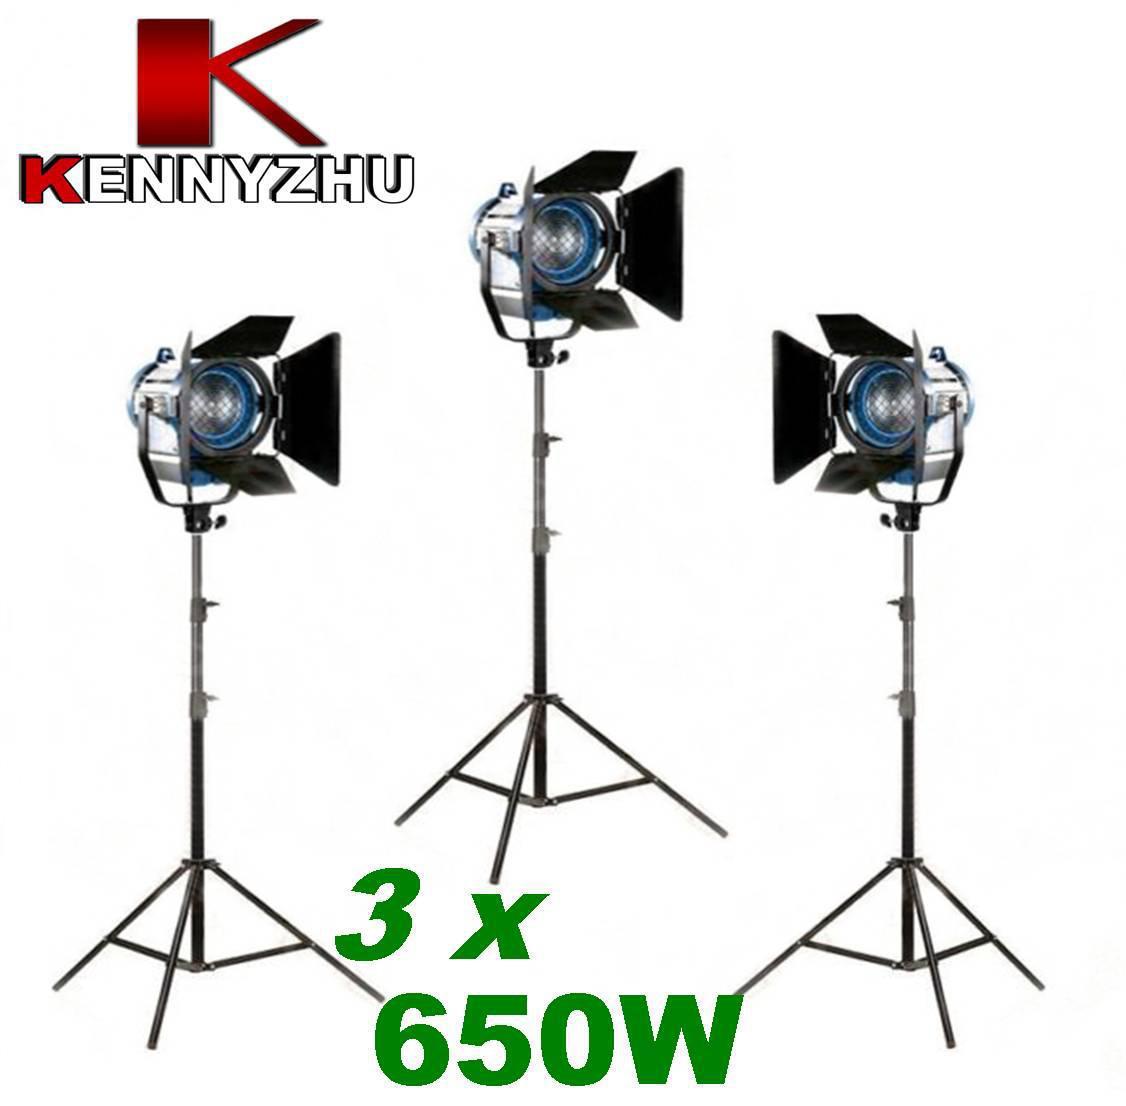 Continous Lighting Kit Video Studio Fresnel Spotlight Tungsten Light 3 X 650W + 2.8m Light Stands + Bag Studio Lighting Kit Light Stand Online with ...  sc 1 st  DHgate.com & Continous Lighting Kit Video Studio Fresnel Spotlight Tungsten Light ...